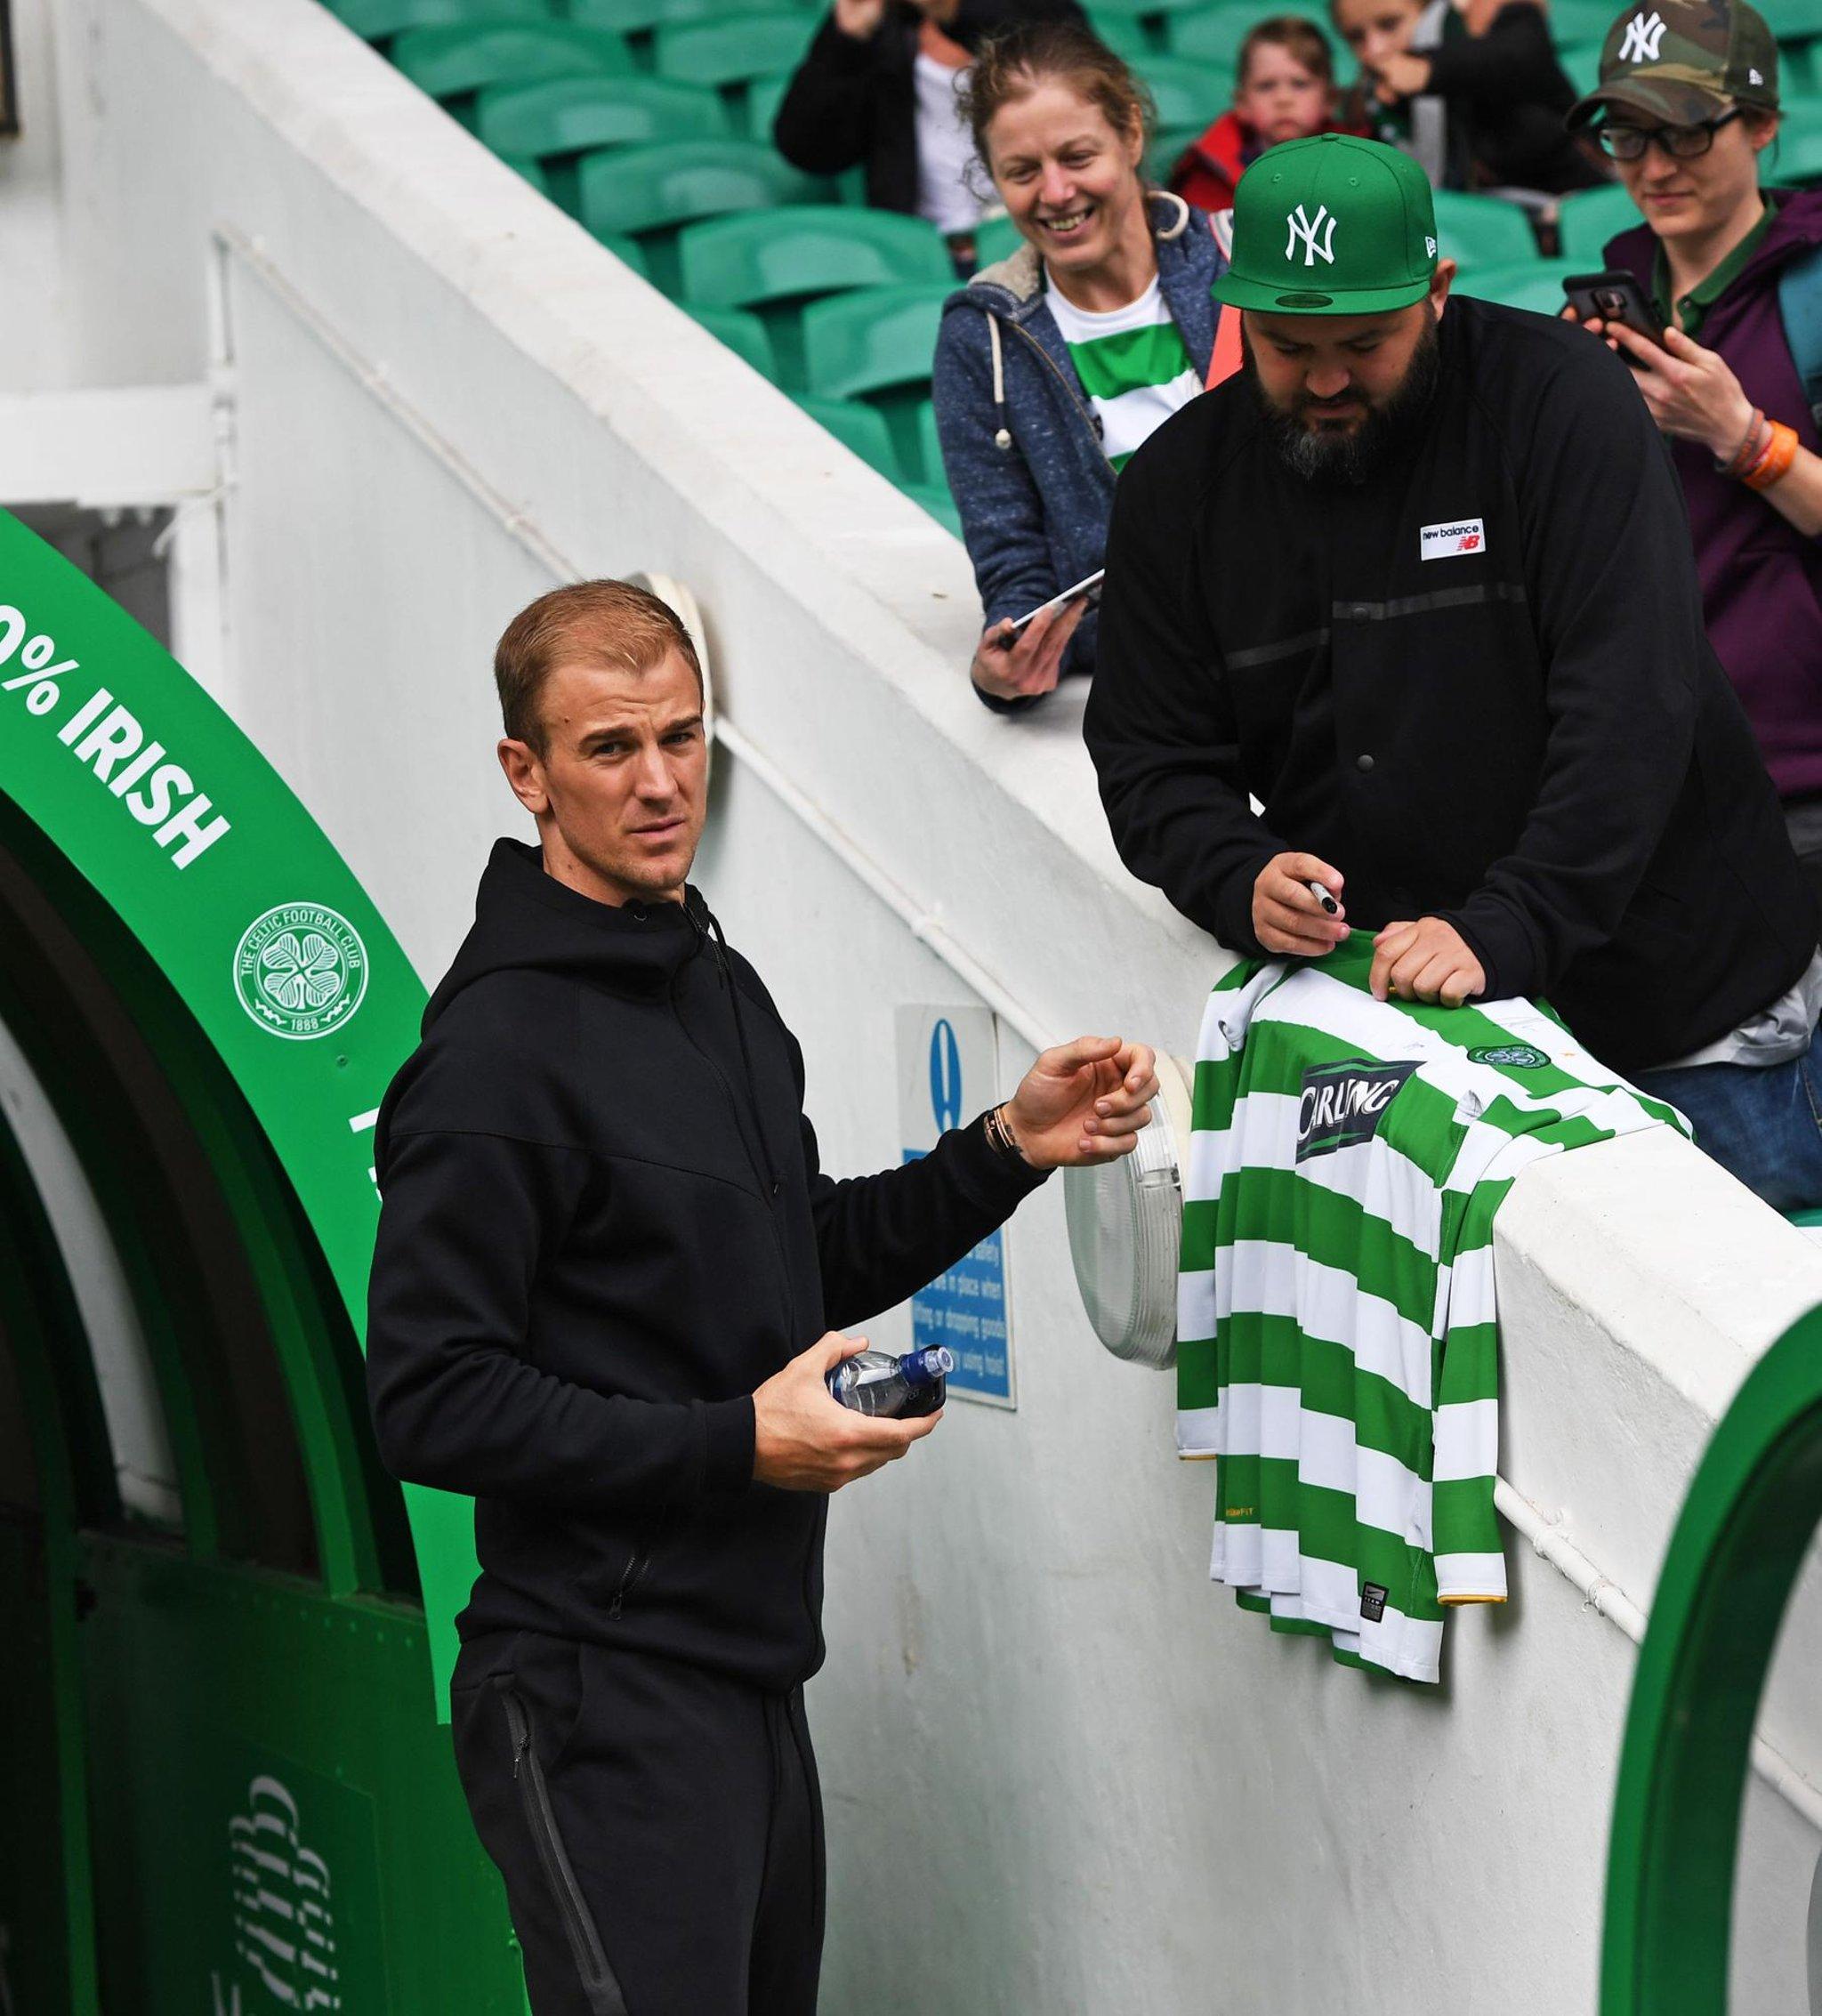 Joe Hart felt Celtic chance had gone as he opens up on Steven Gerrard relationship and being written off